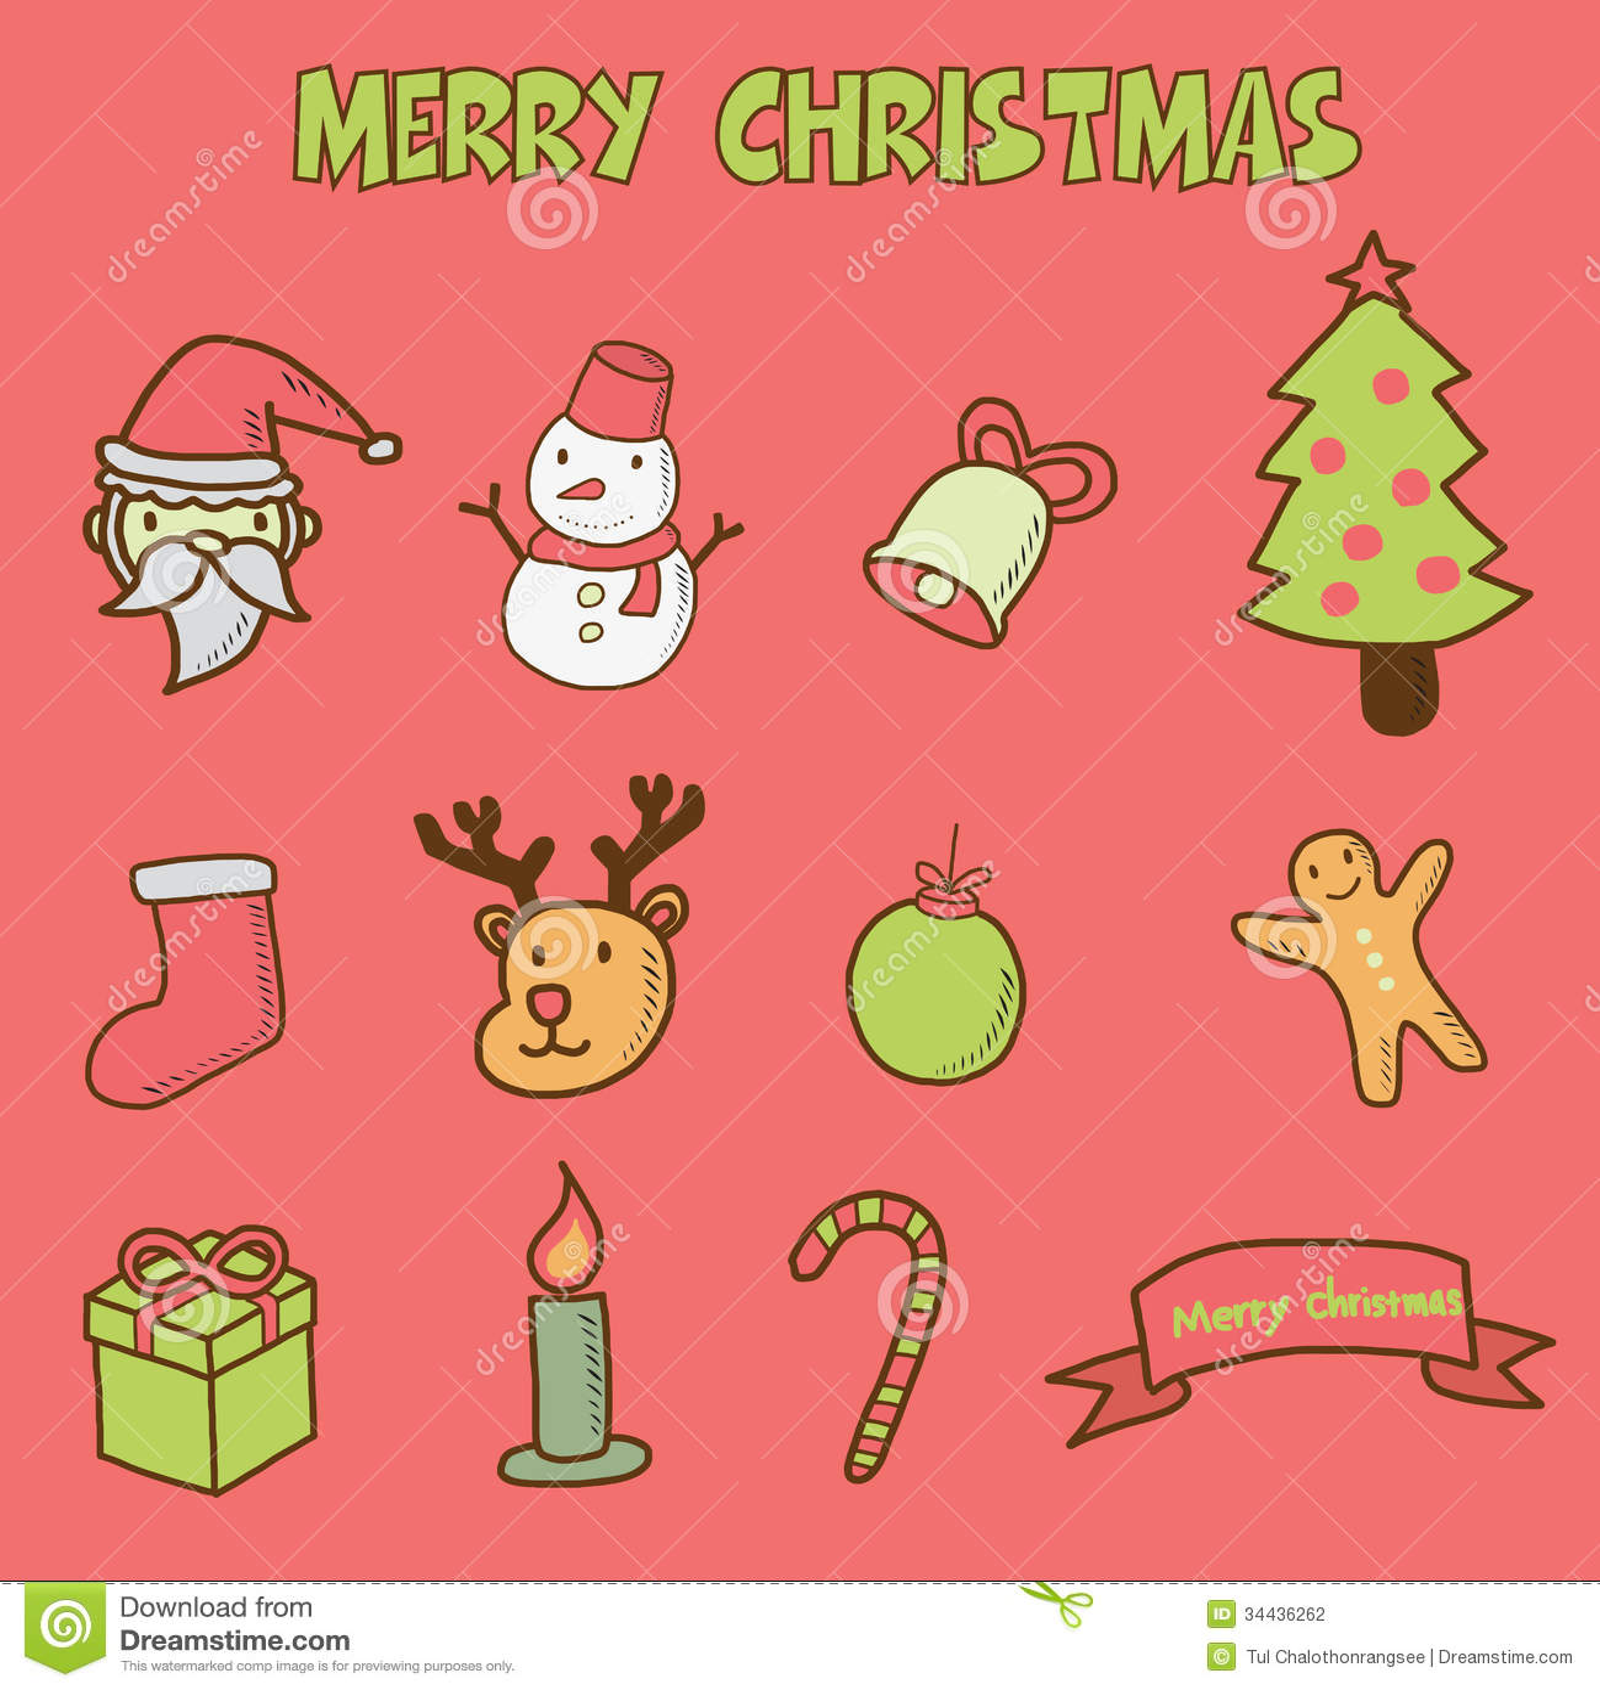 Merry christmas gift 9